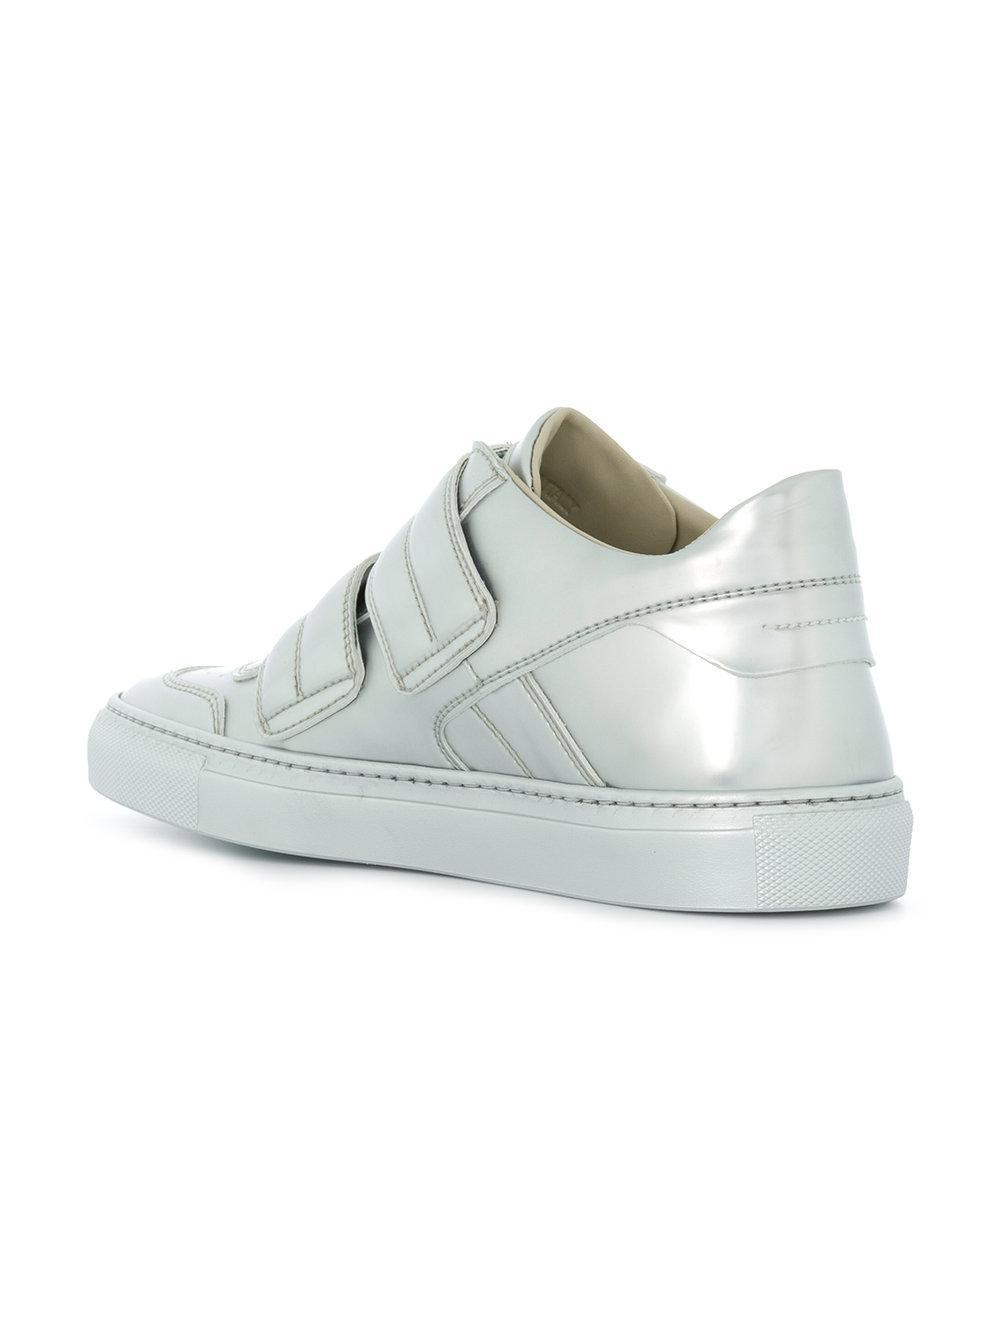 contrast strap sneakers - Grey Maison Martin Margiela YqFBTU